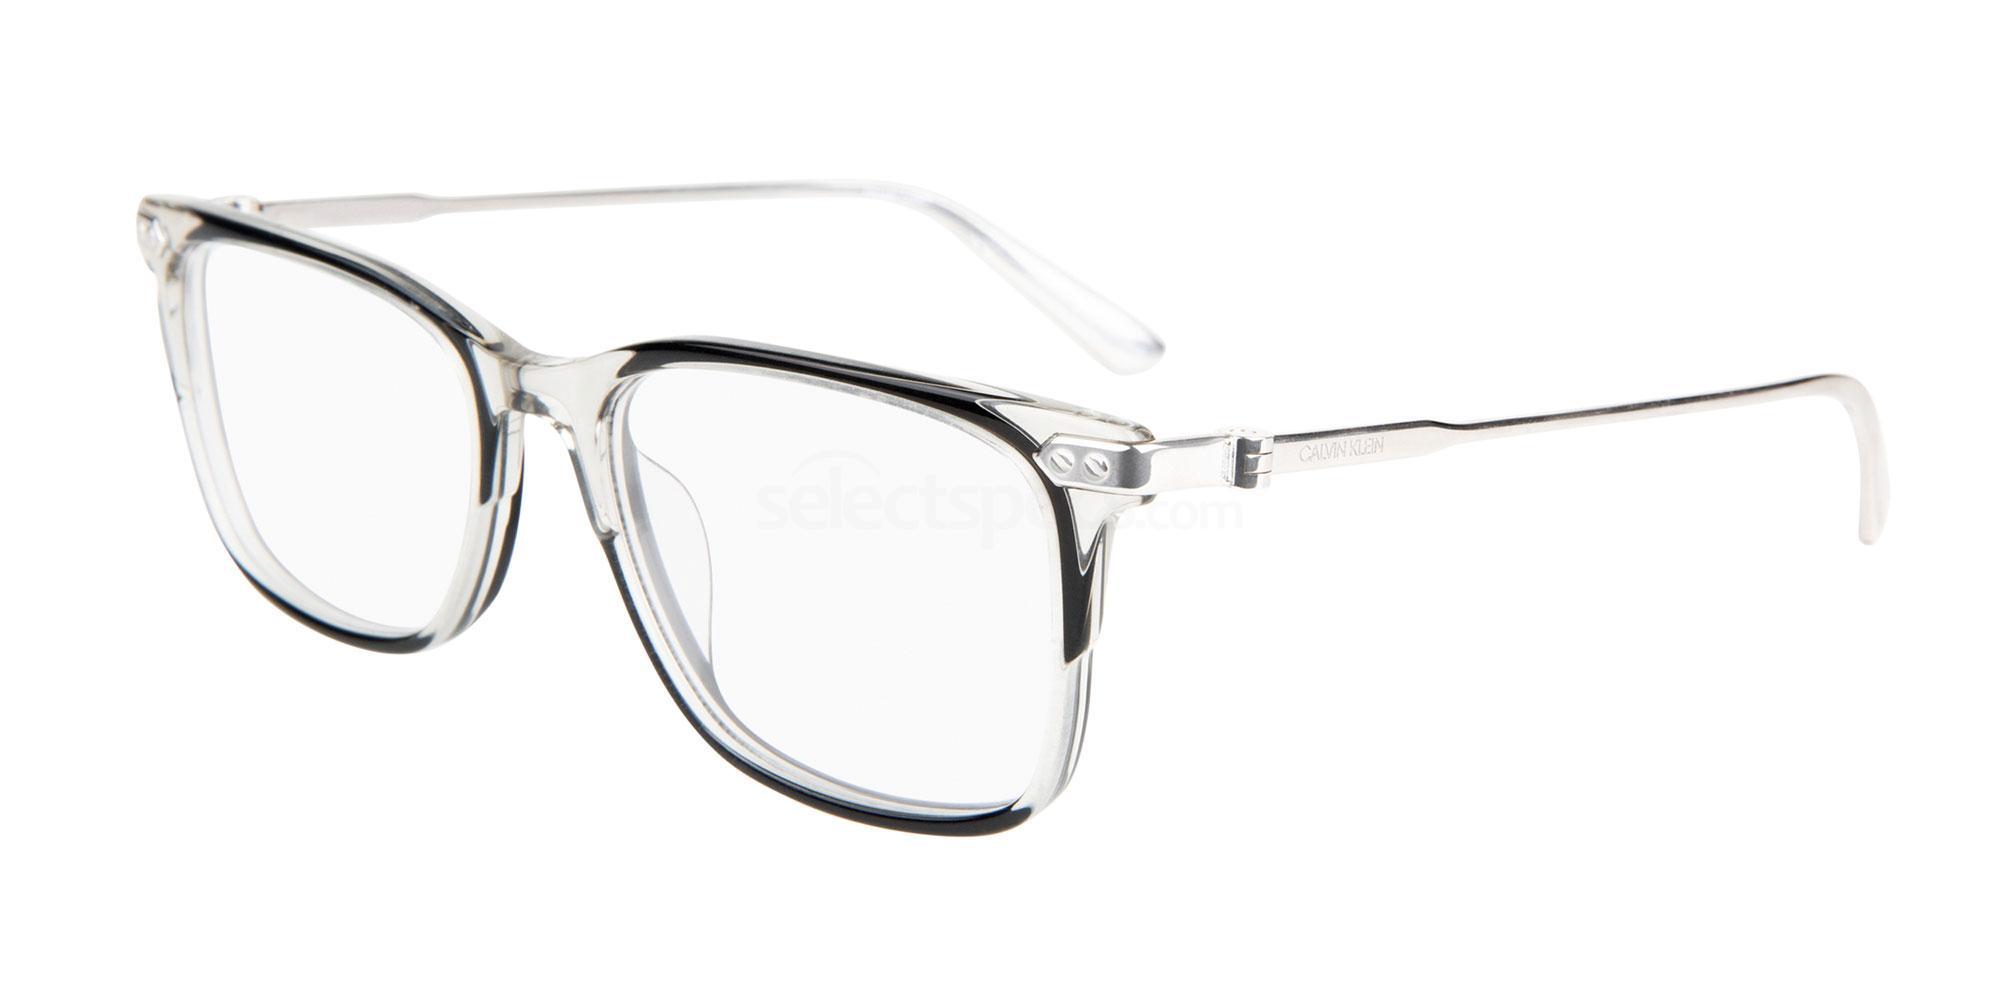 072 CK18704 Glasses, Calvin Klein